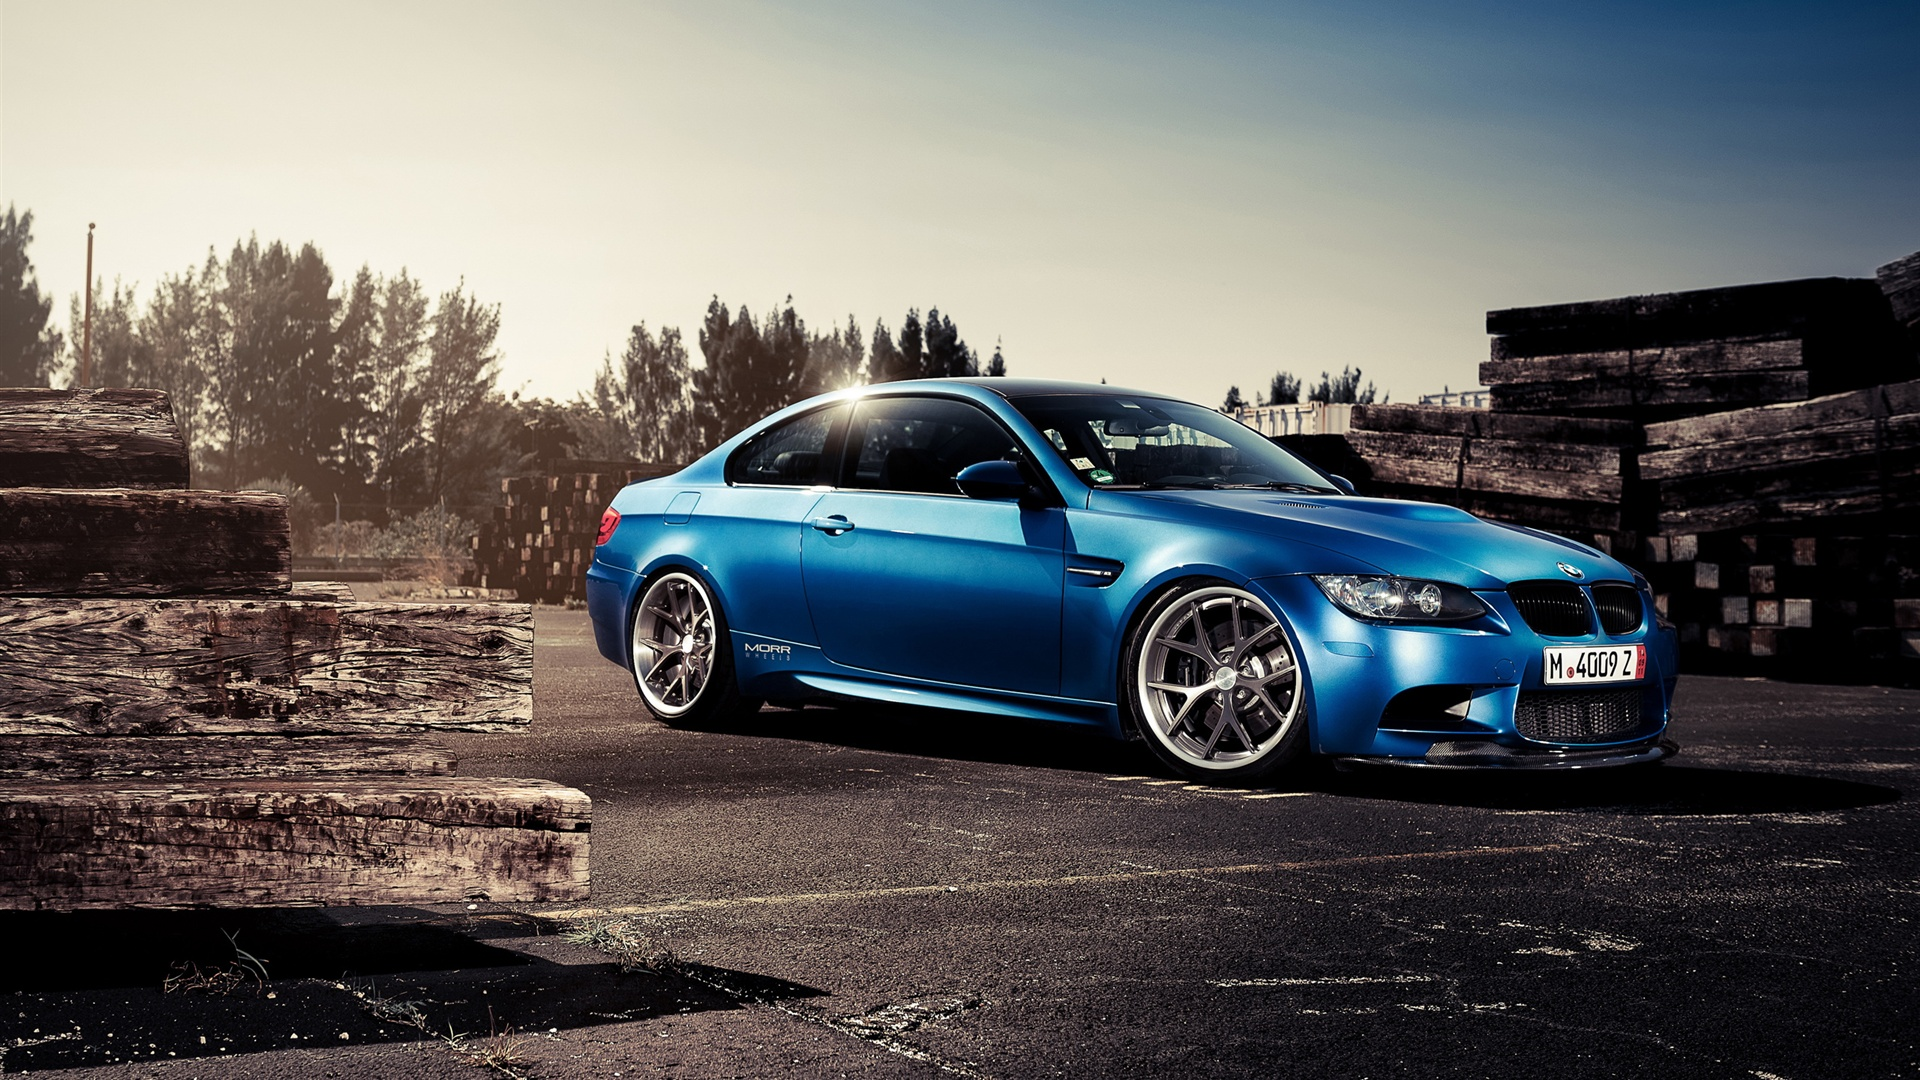 Wallpaper BMW M3 blue car side view 2560x1600 HD Picture ...